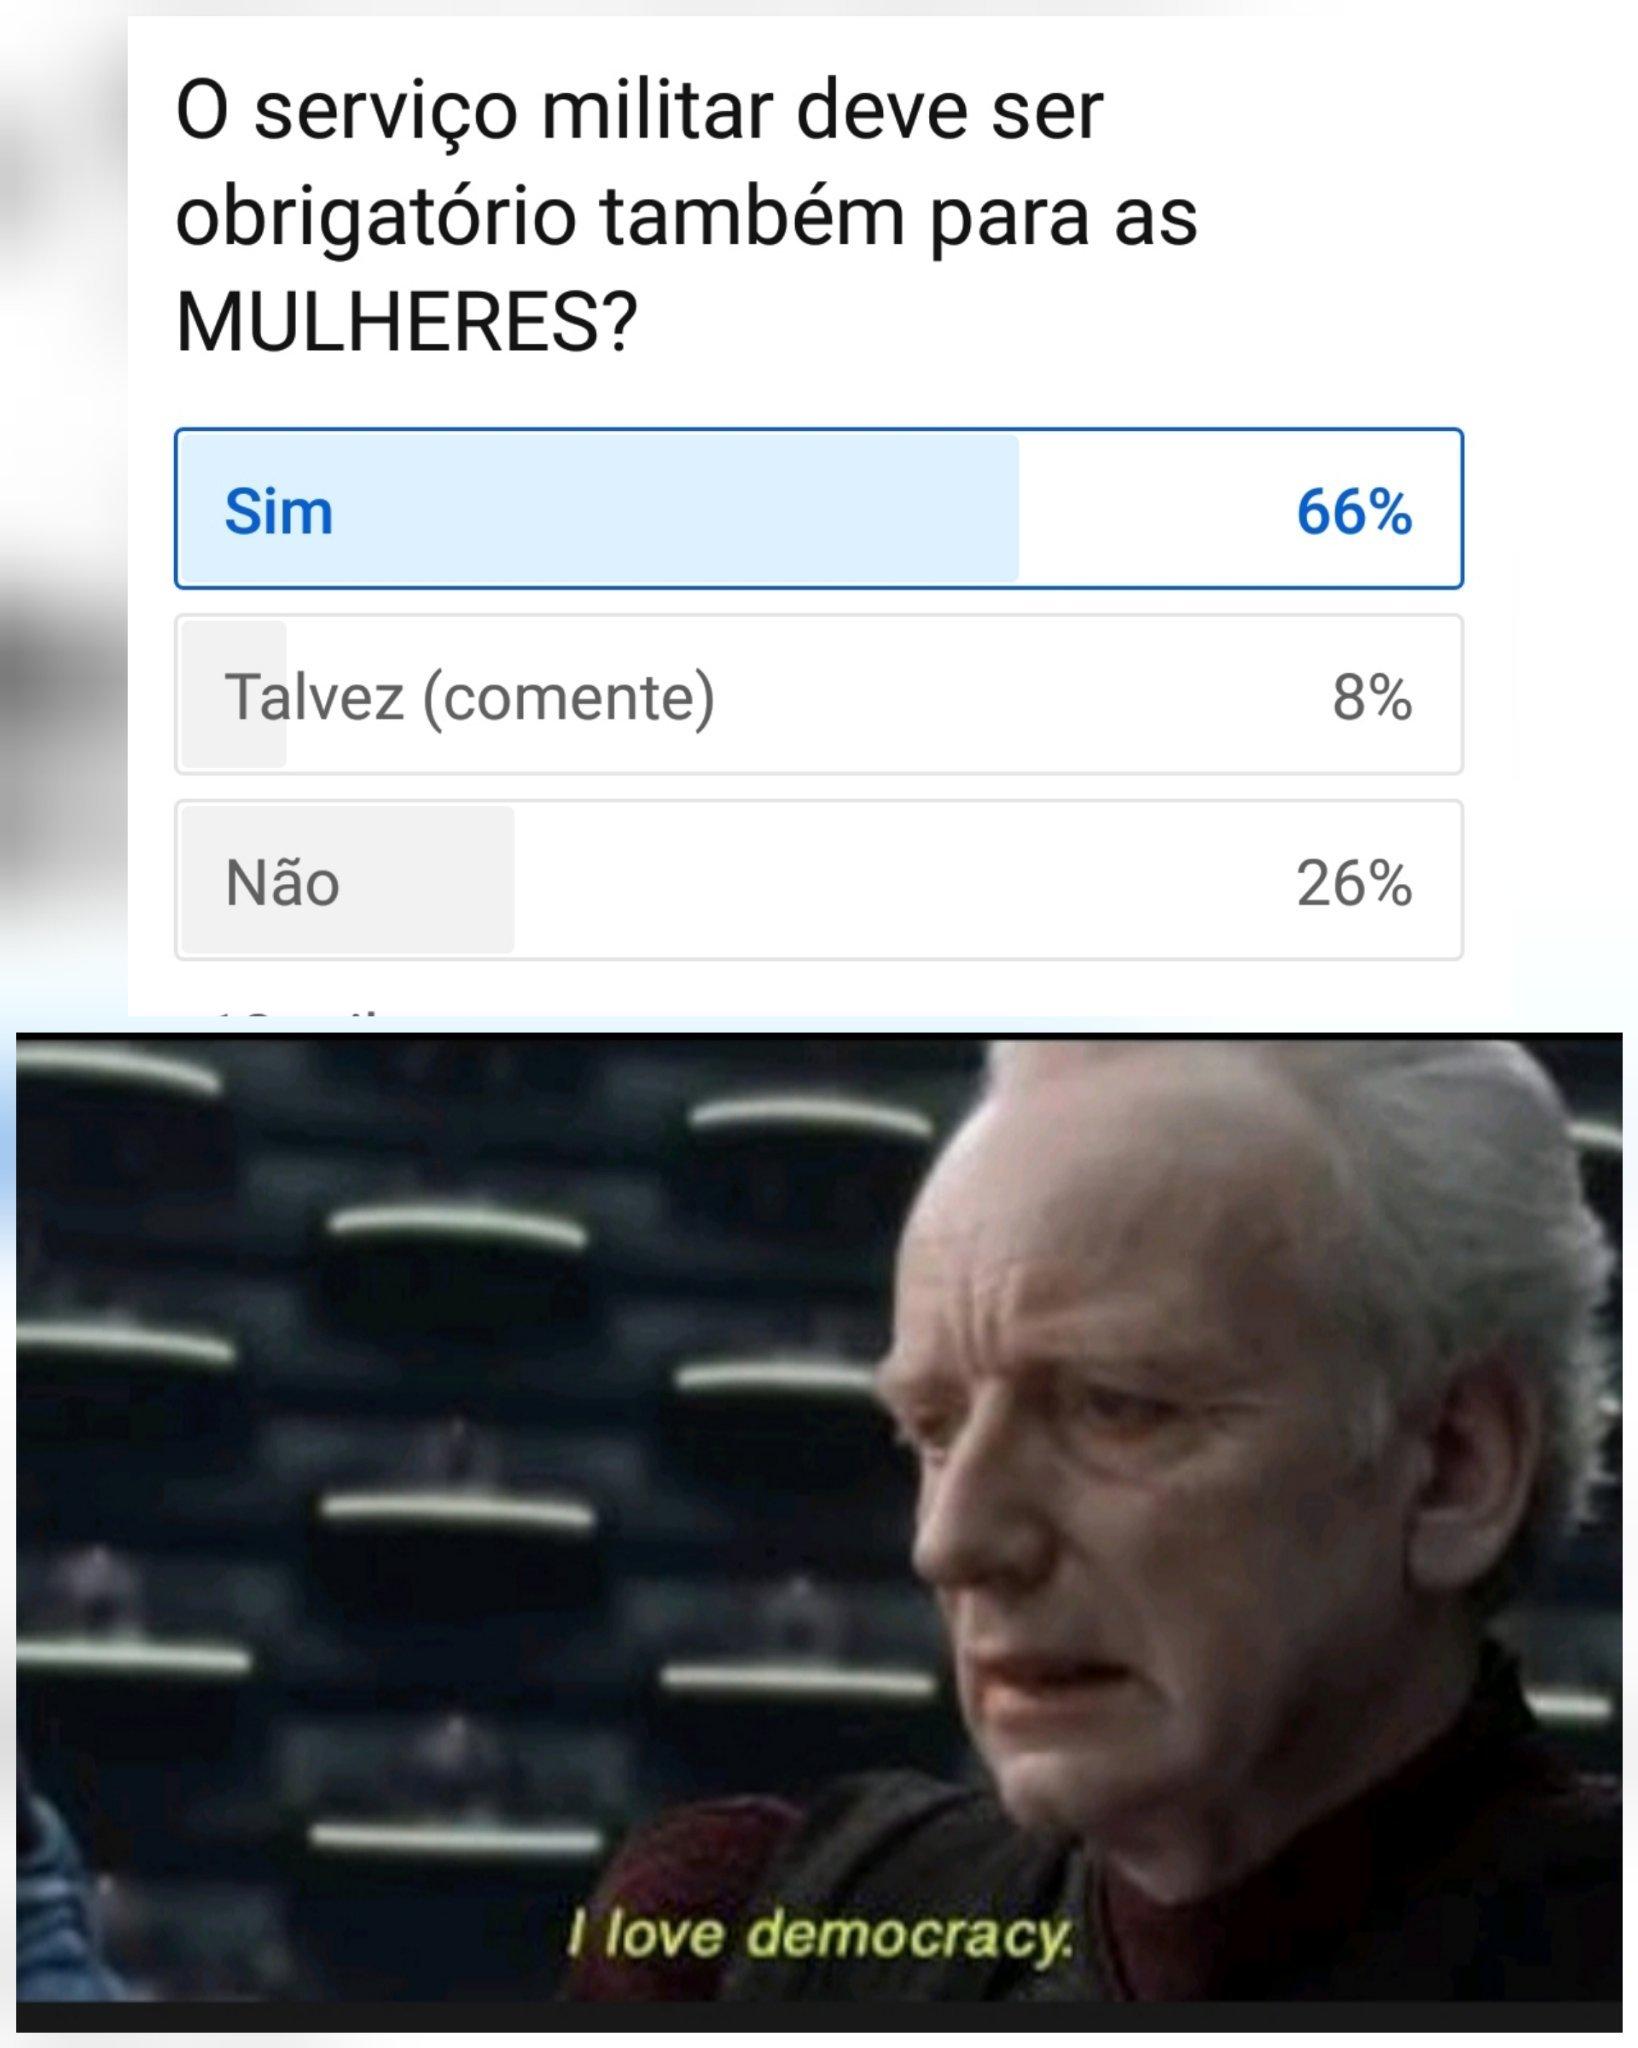 I Love democracy - meme